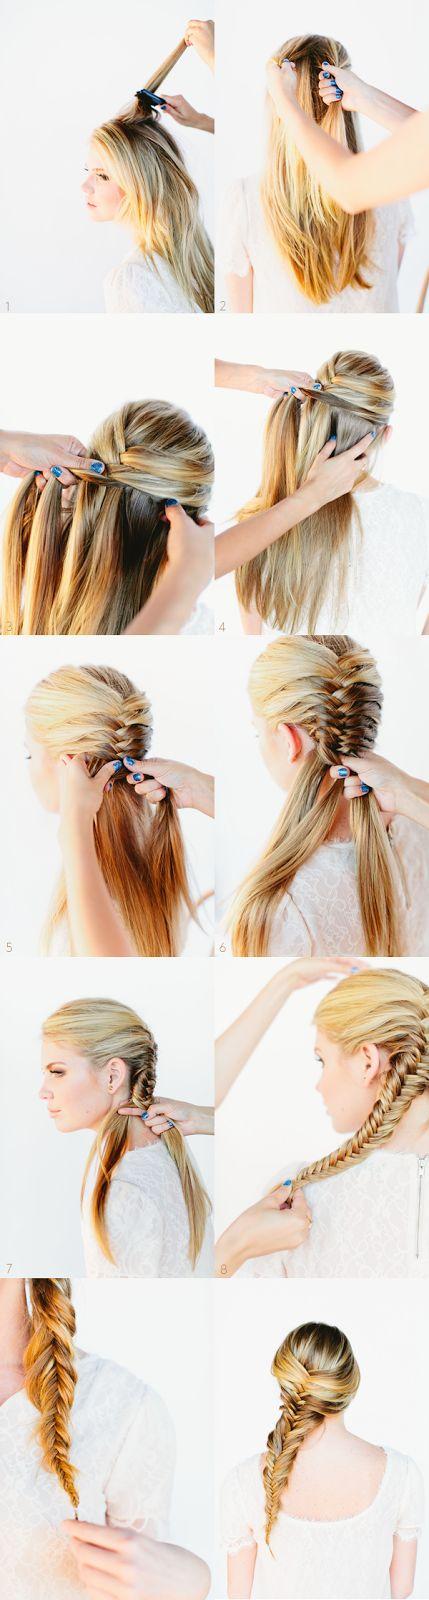 #hairstyle #hairdo #tutorial #DIY #inspiration